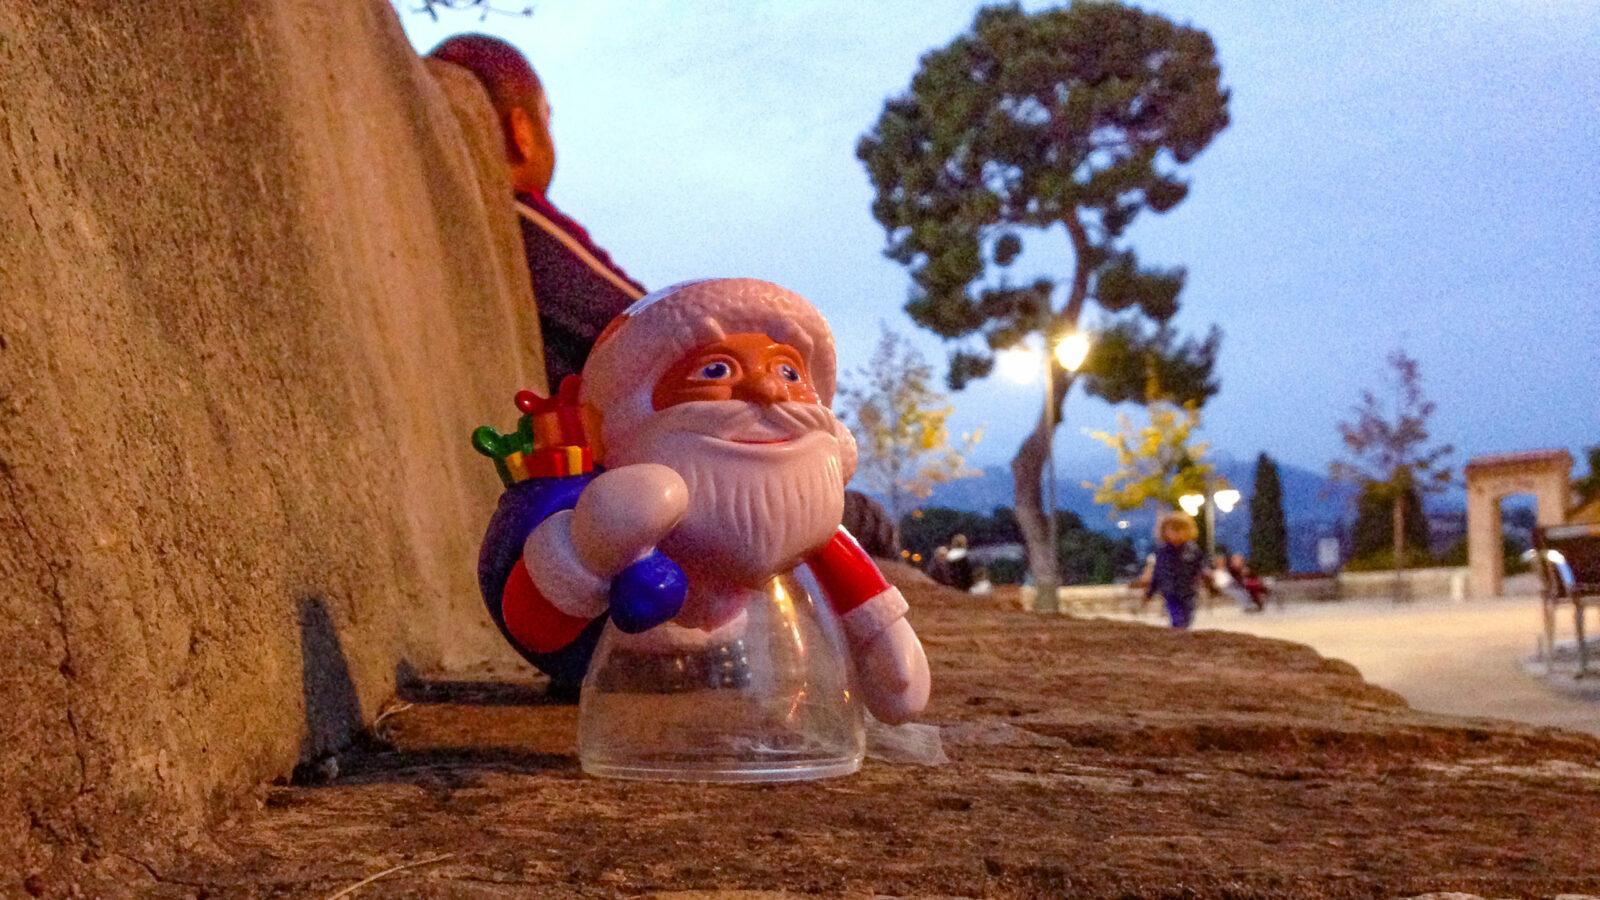 Haut-de-Cagnes, Weihnachtsschmuck. Foto: Hilke Maunder